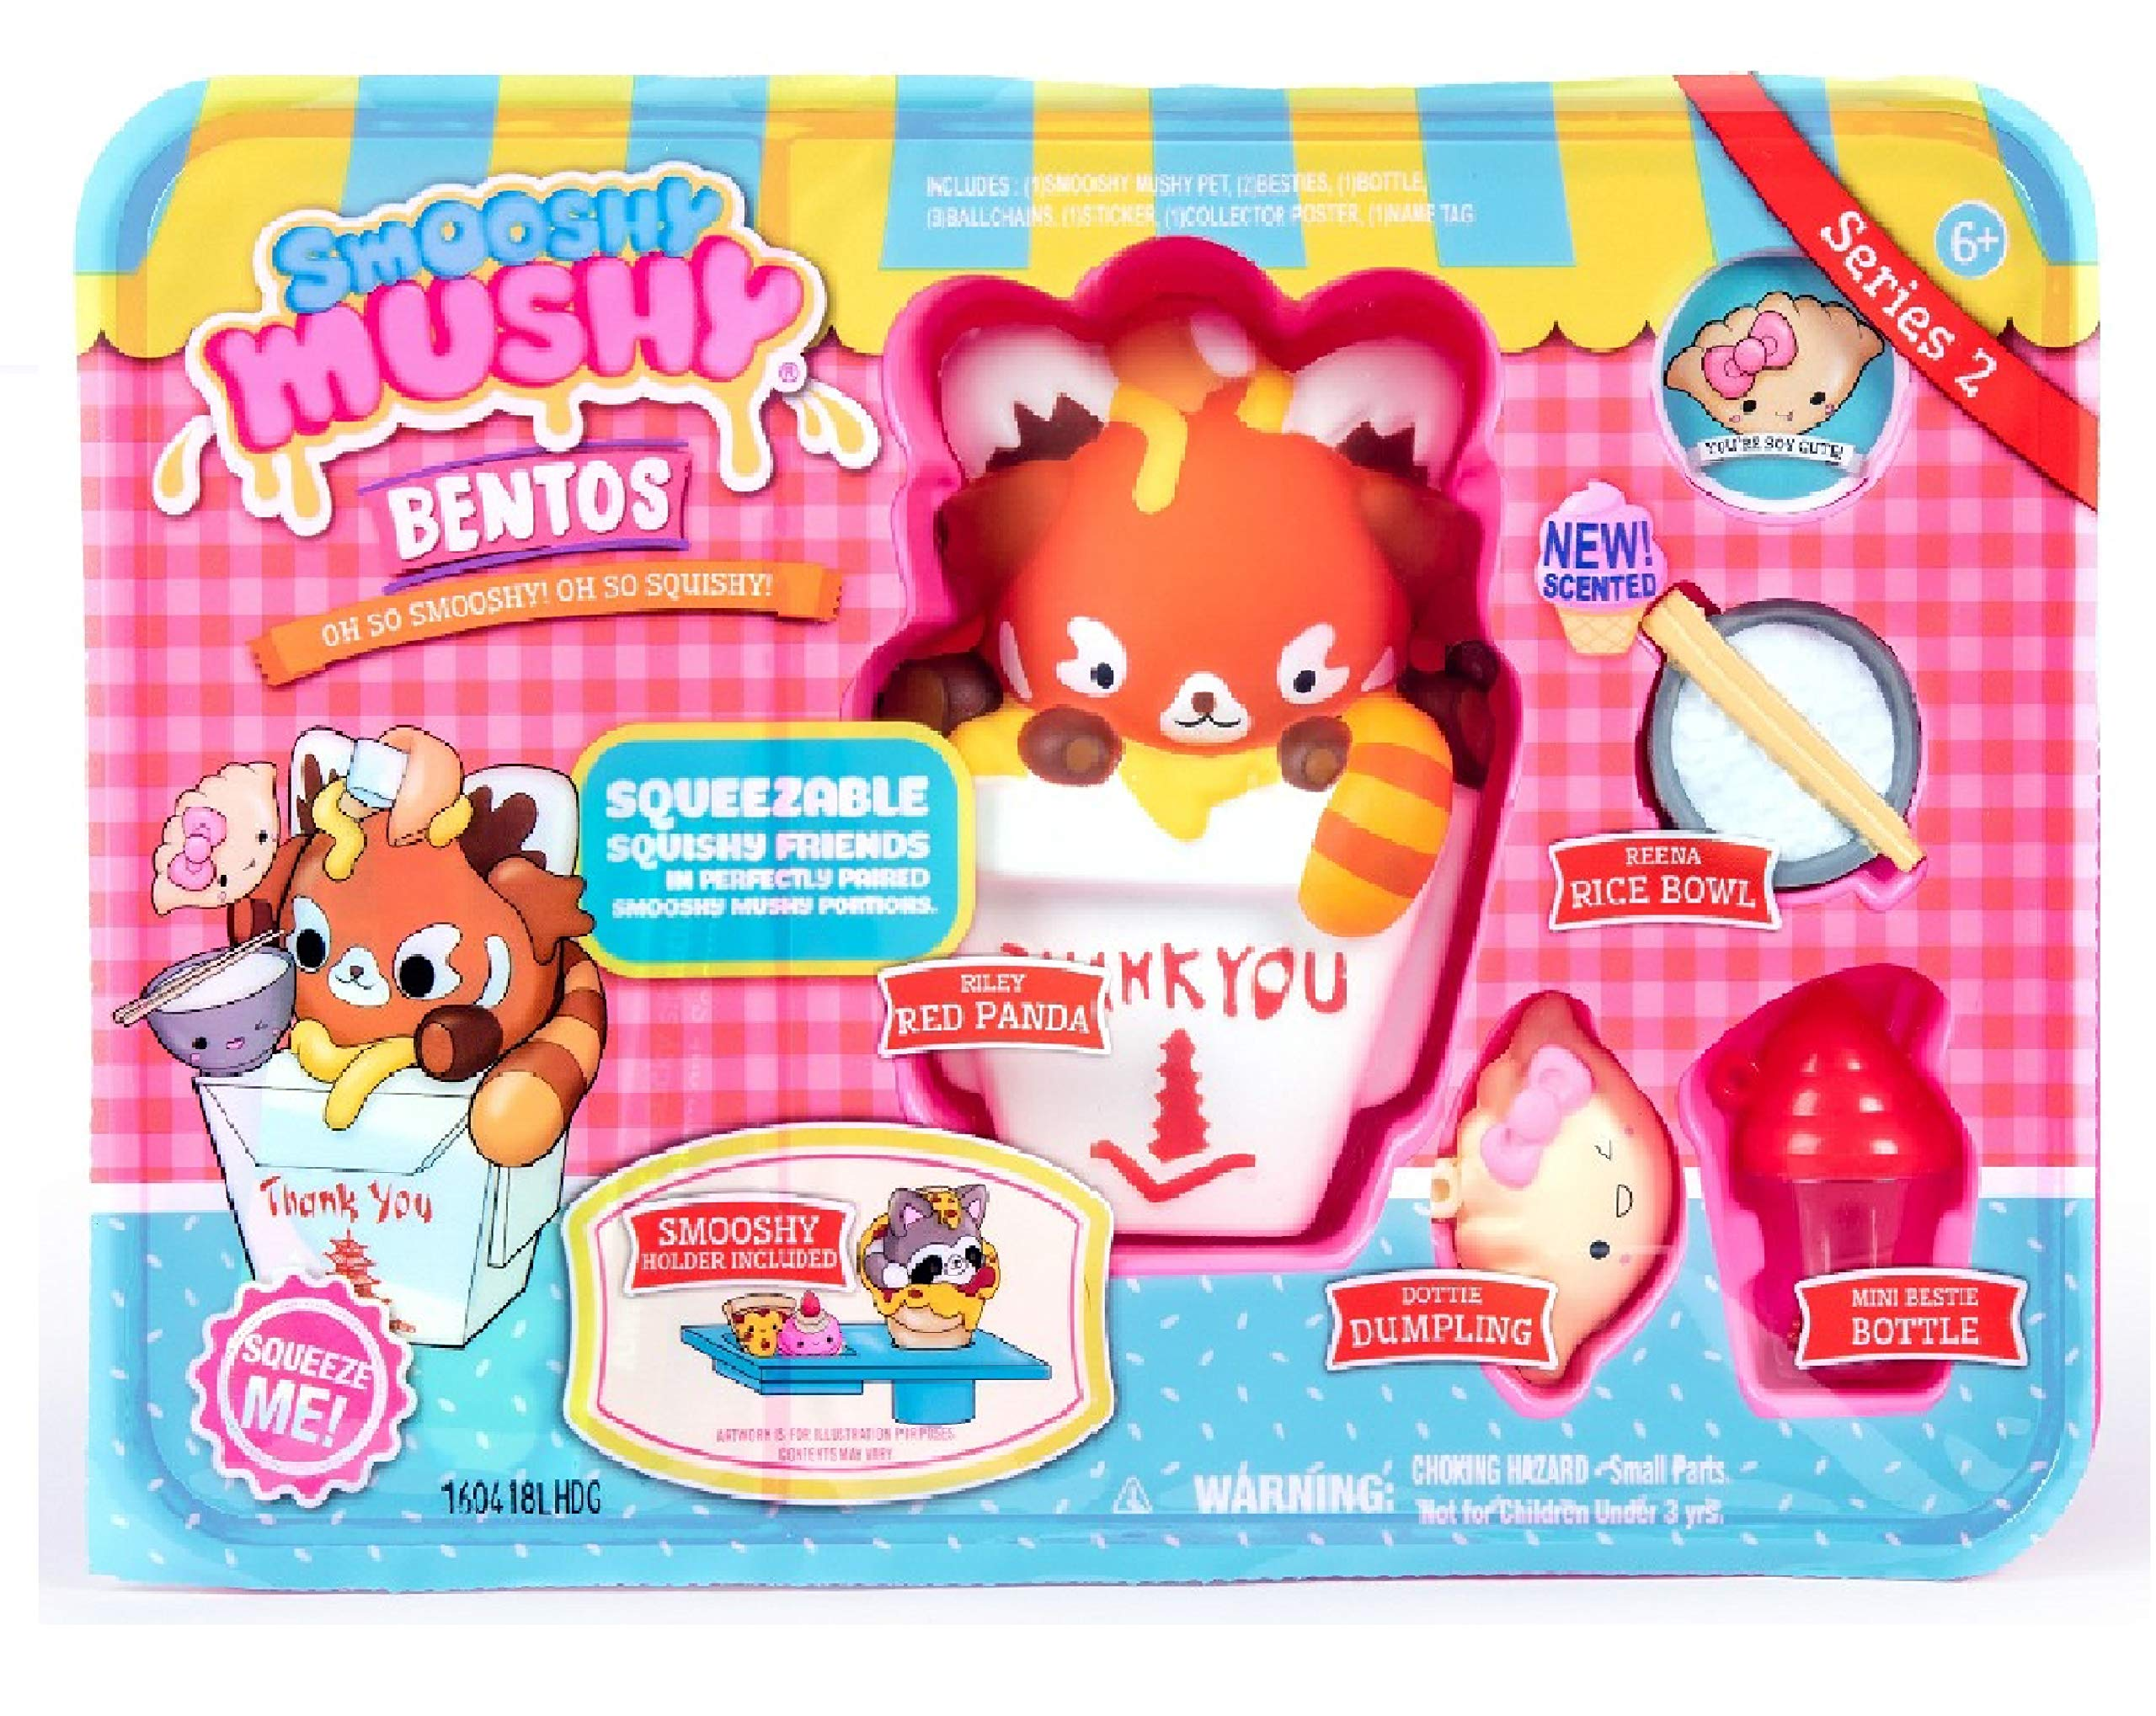 Smooshy Mushy Plastic Bentos Box Series 2 - Riley Red Panda Squishy Toy